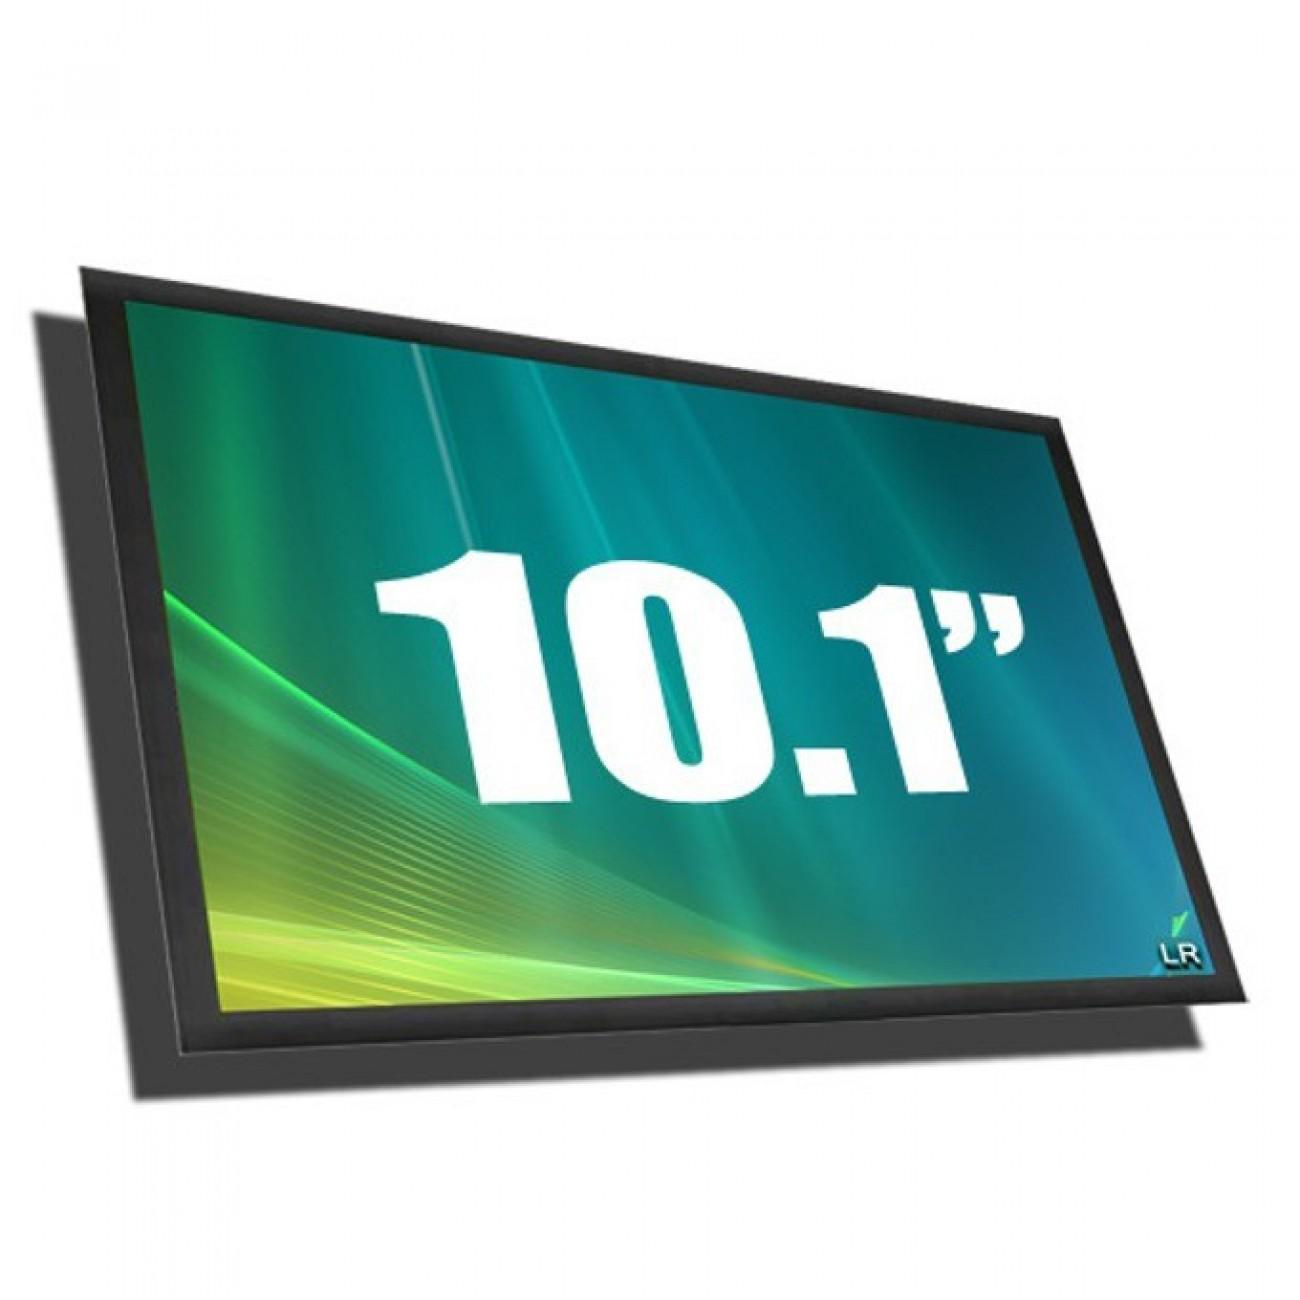 Матрица за лаптоп CPT CLAA101NA0ACN MATT, 10.1 (25.65 cm) WSVGA 1024 x 576 pix., матов в Резервни части -  | Alleop